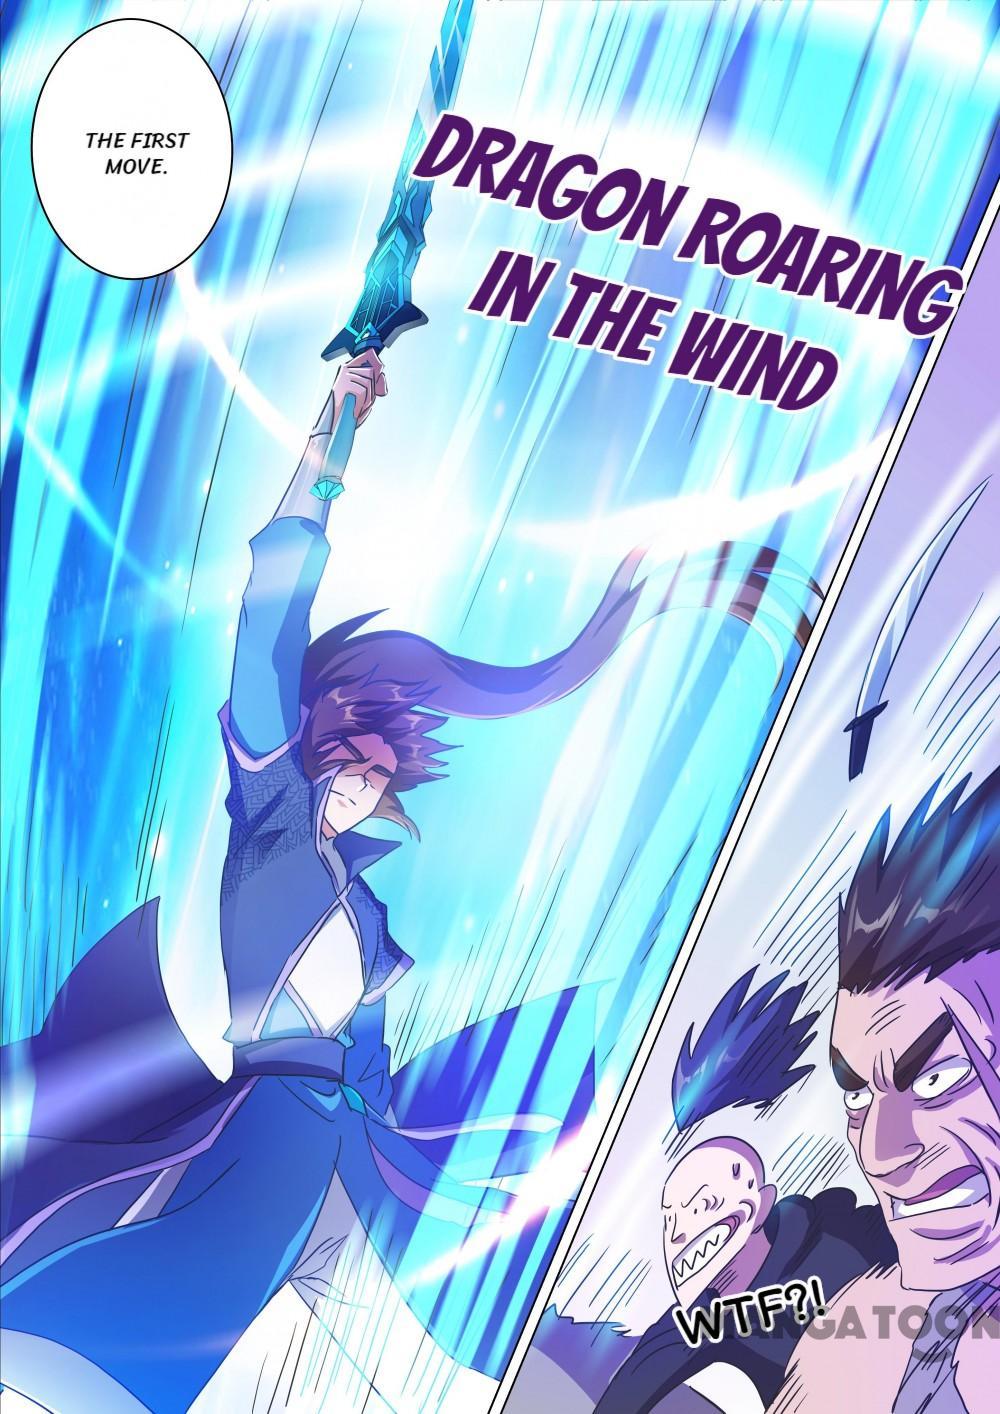 Spirit Sword sovereign chapter 202 English - ReadRawManga